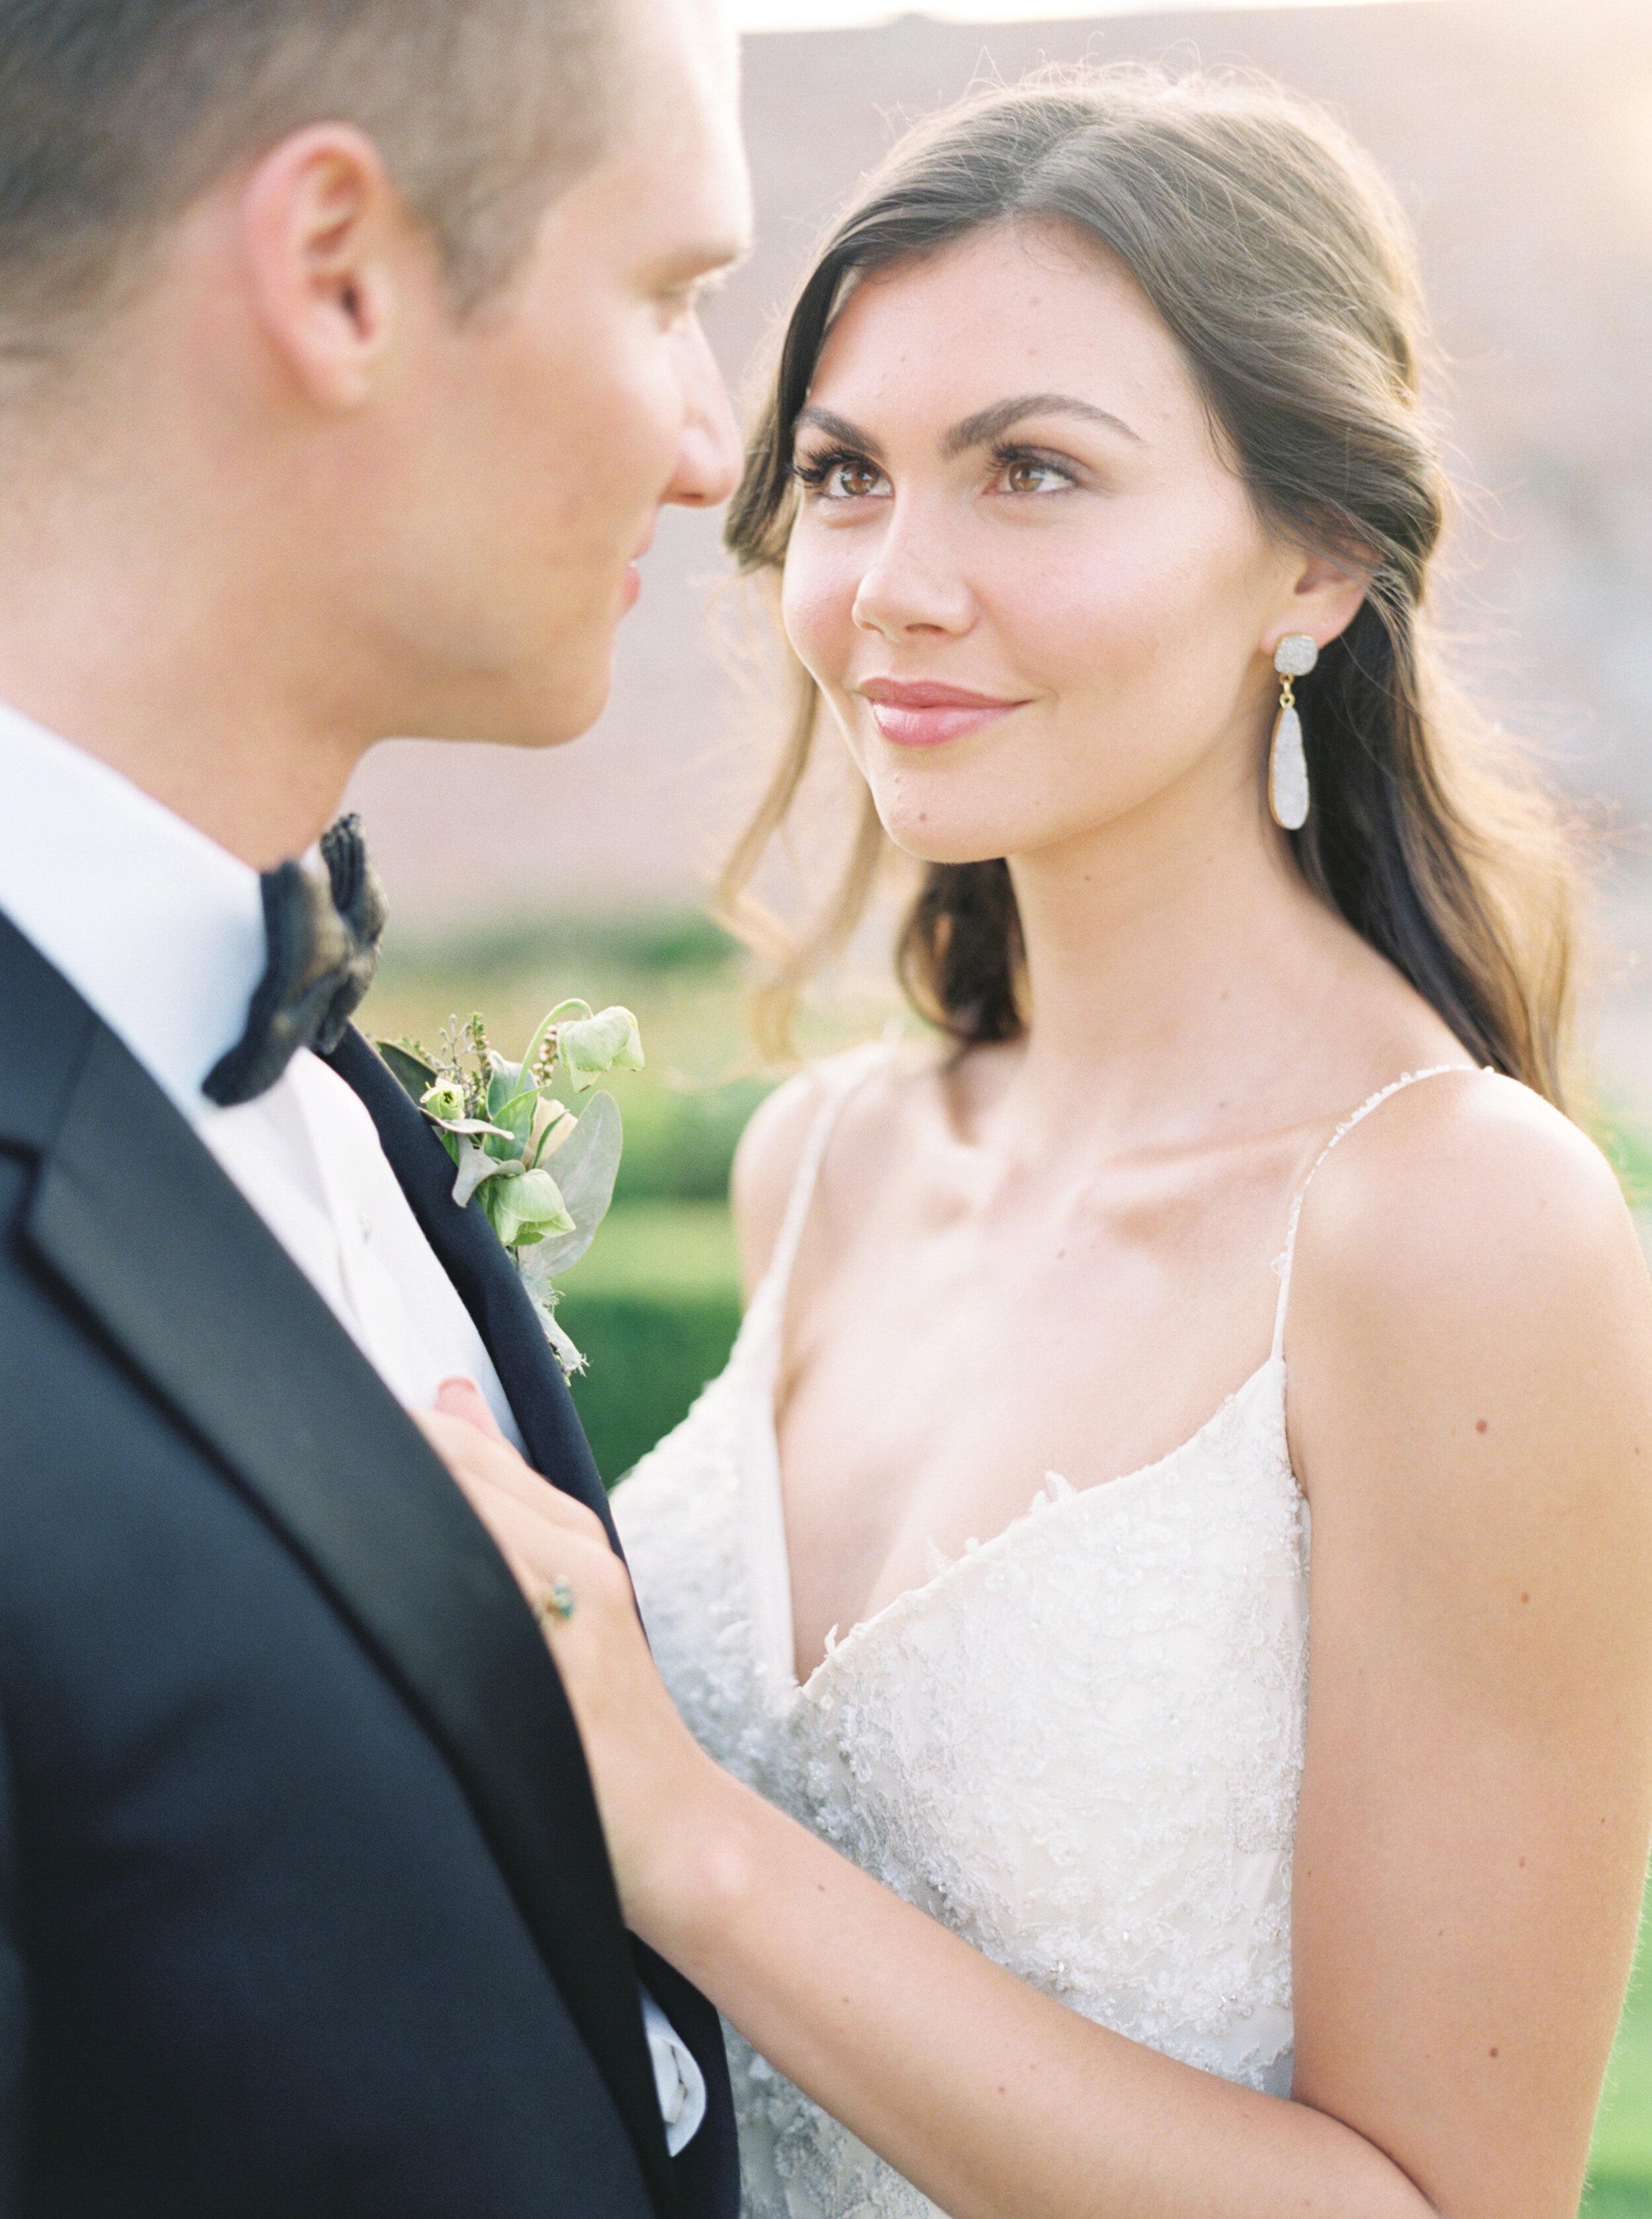 Bibb_Mill_Wedding_Editorial_Columbus_Georgia_Fallen_Photography_6-52.JPG